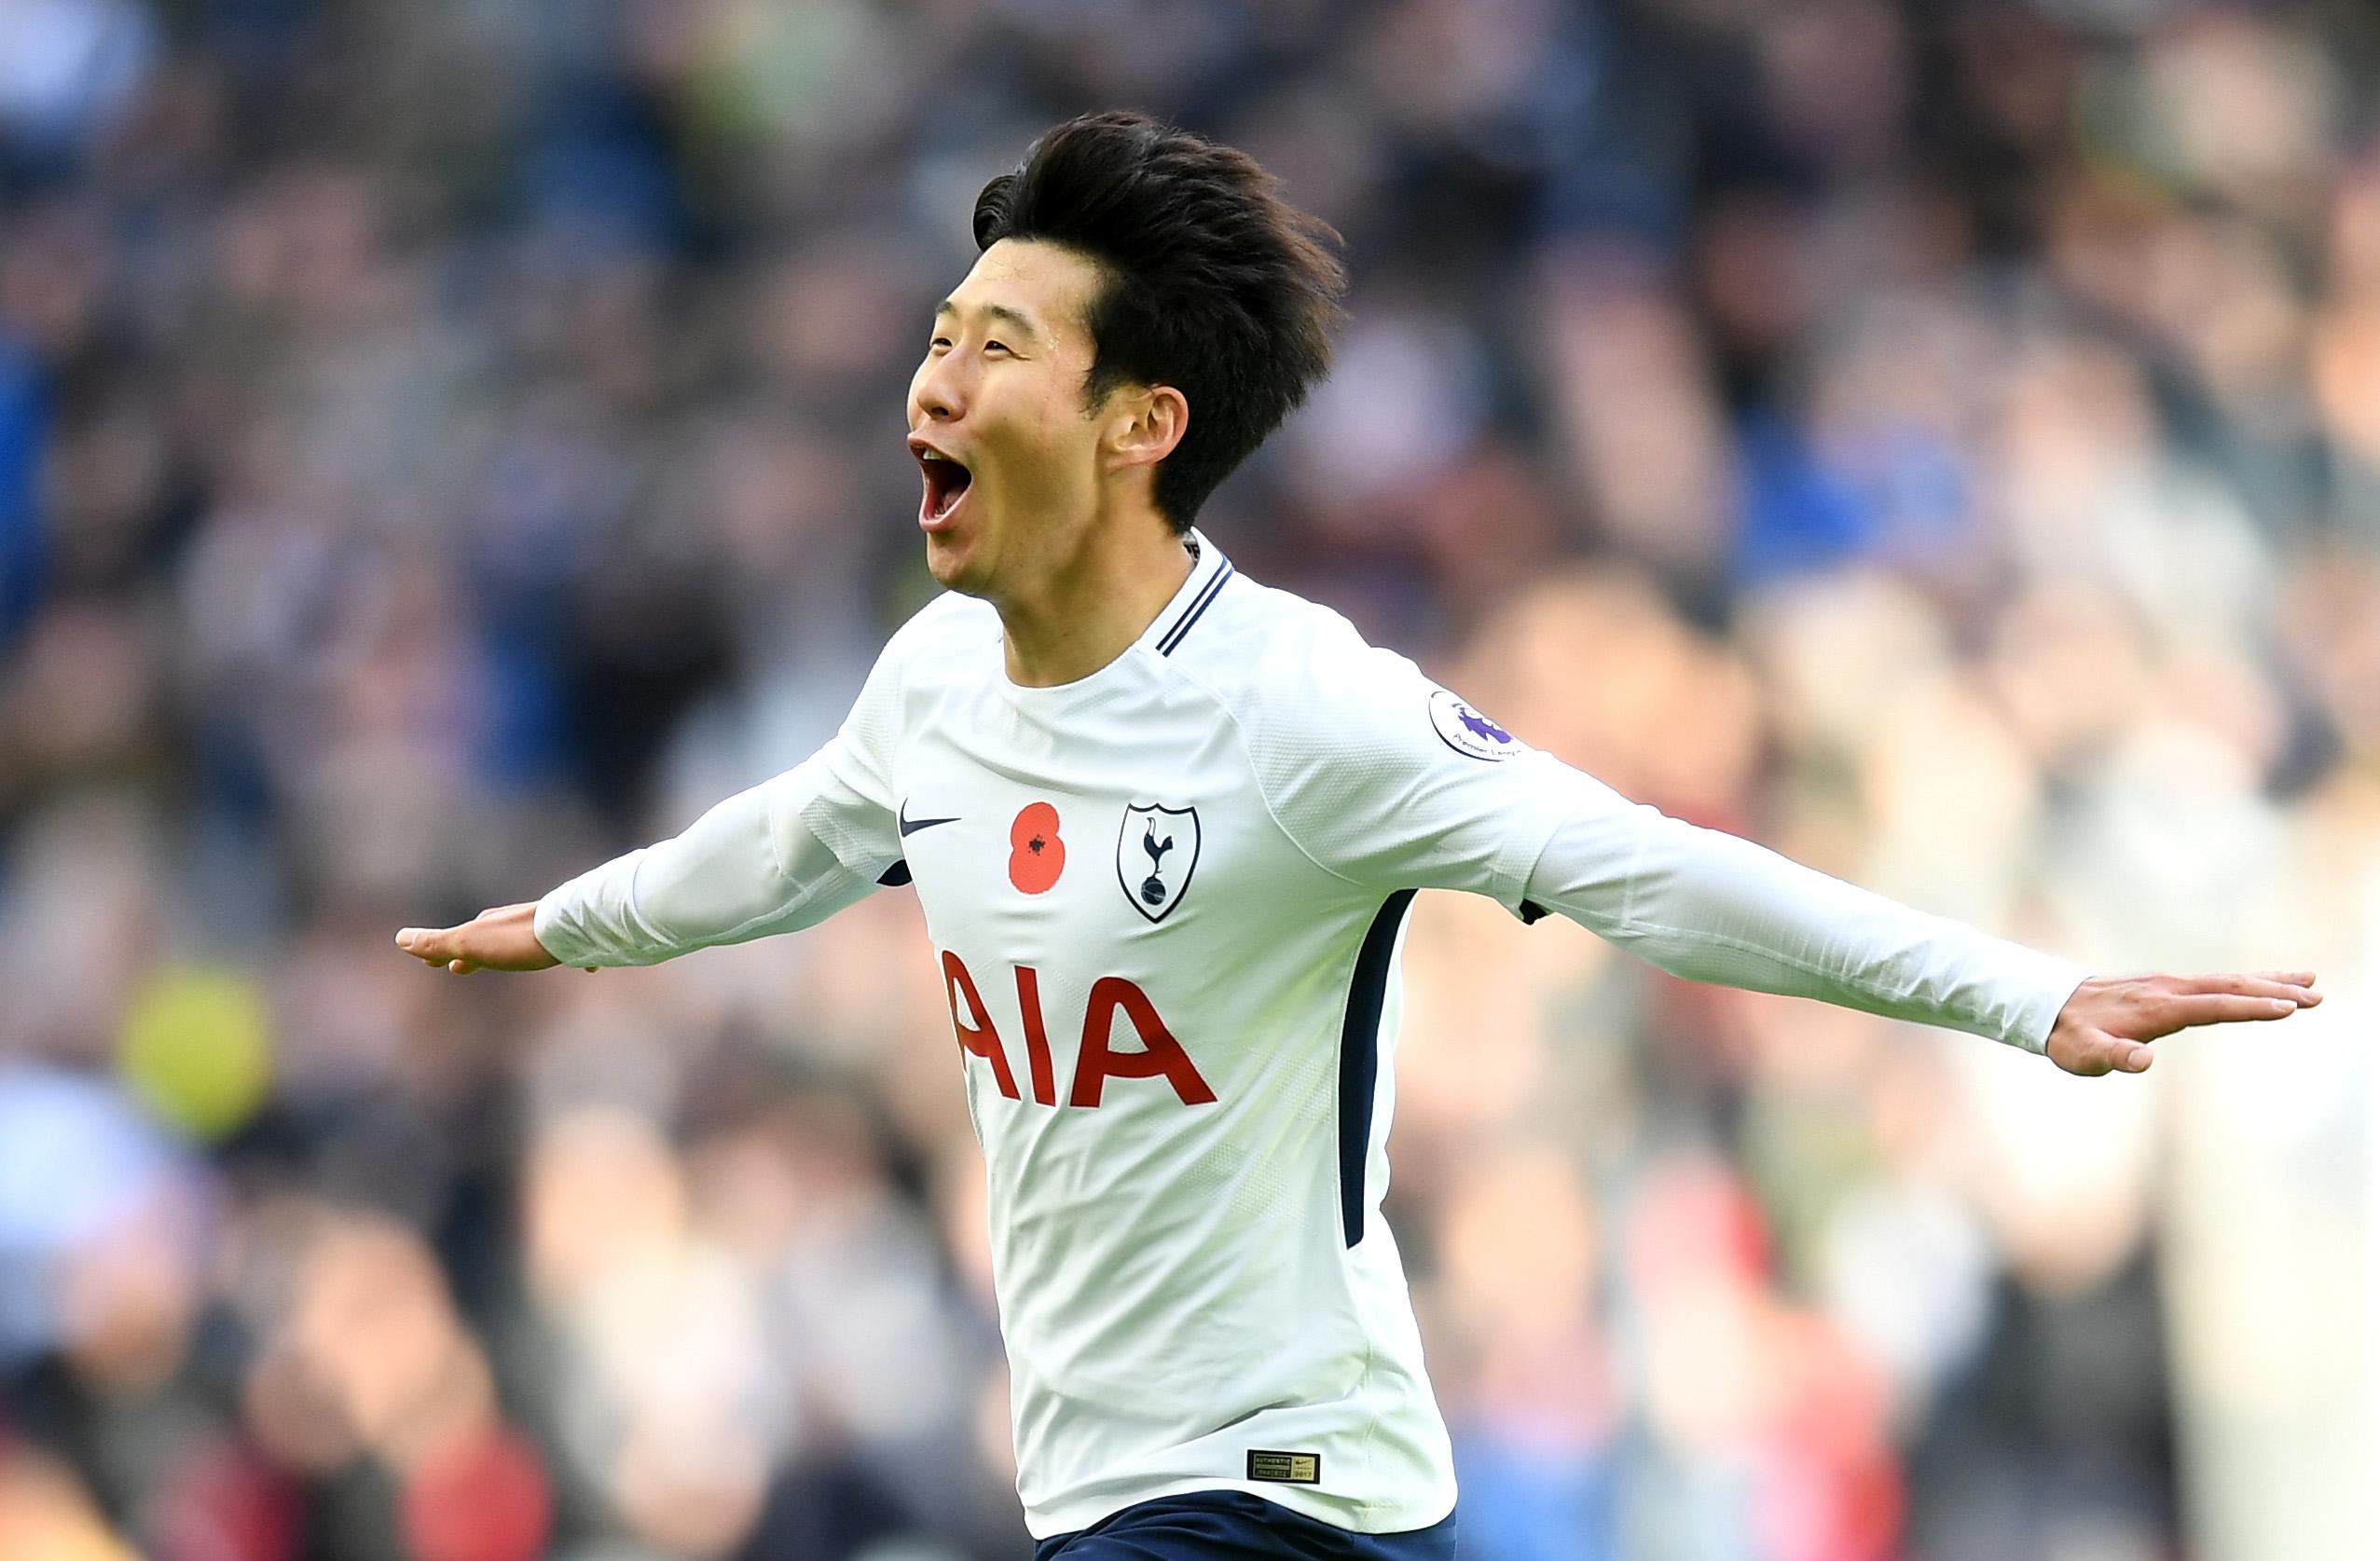 Heung Min Son Tottenham Hotspur Crystal Palace 11/05/17